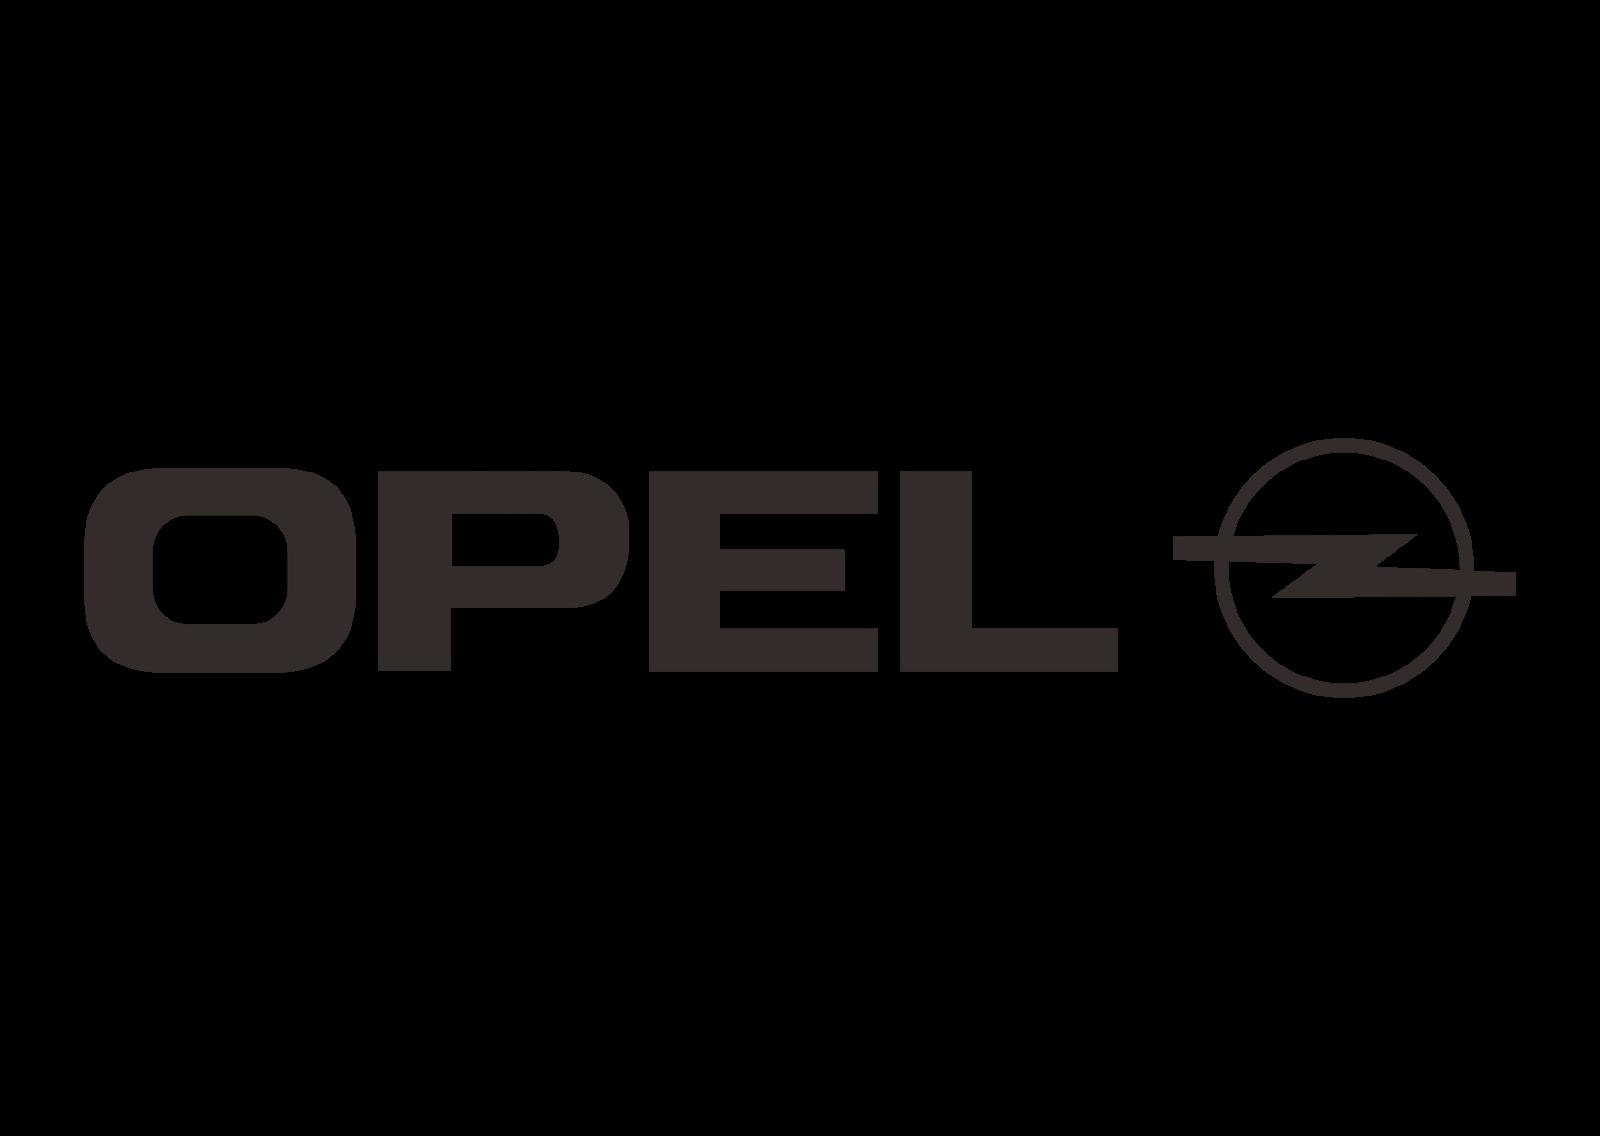 Opel Logo OPel  Design Part-2